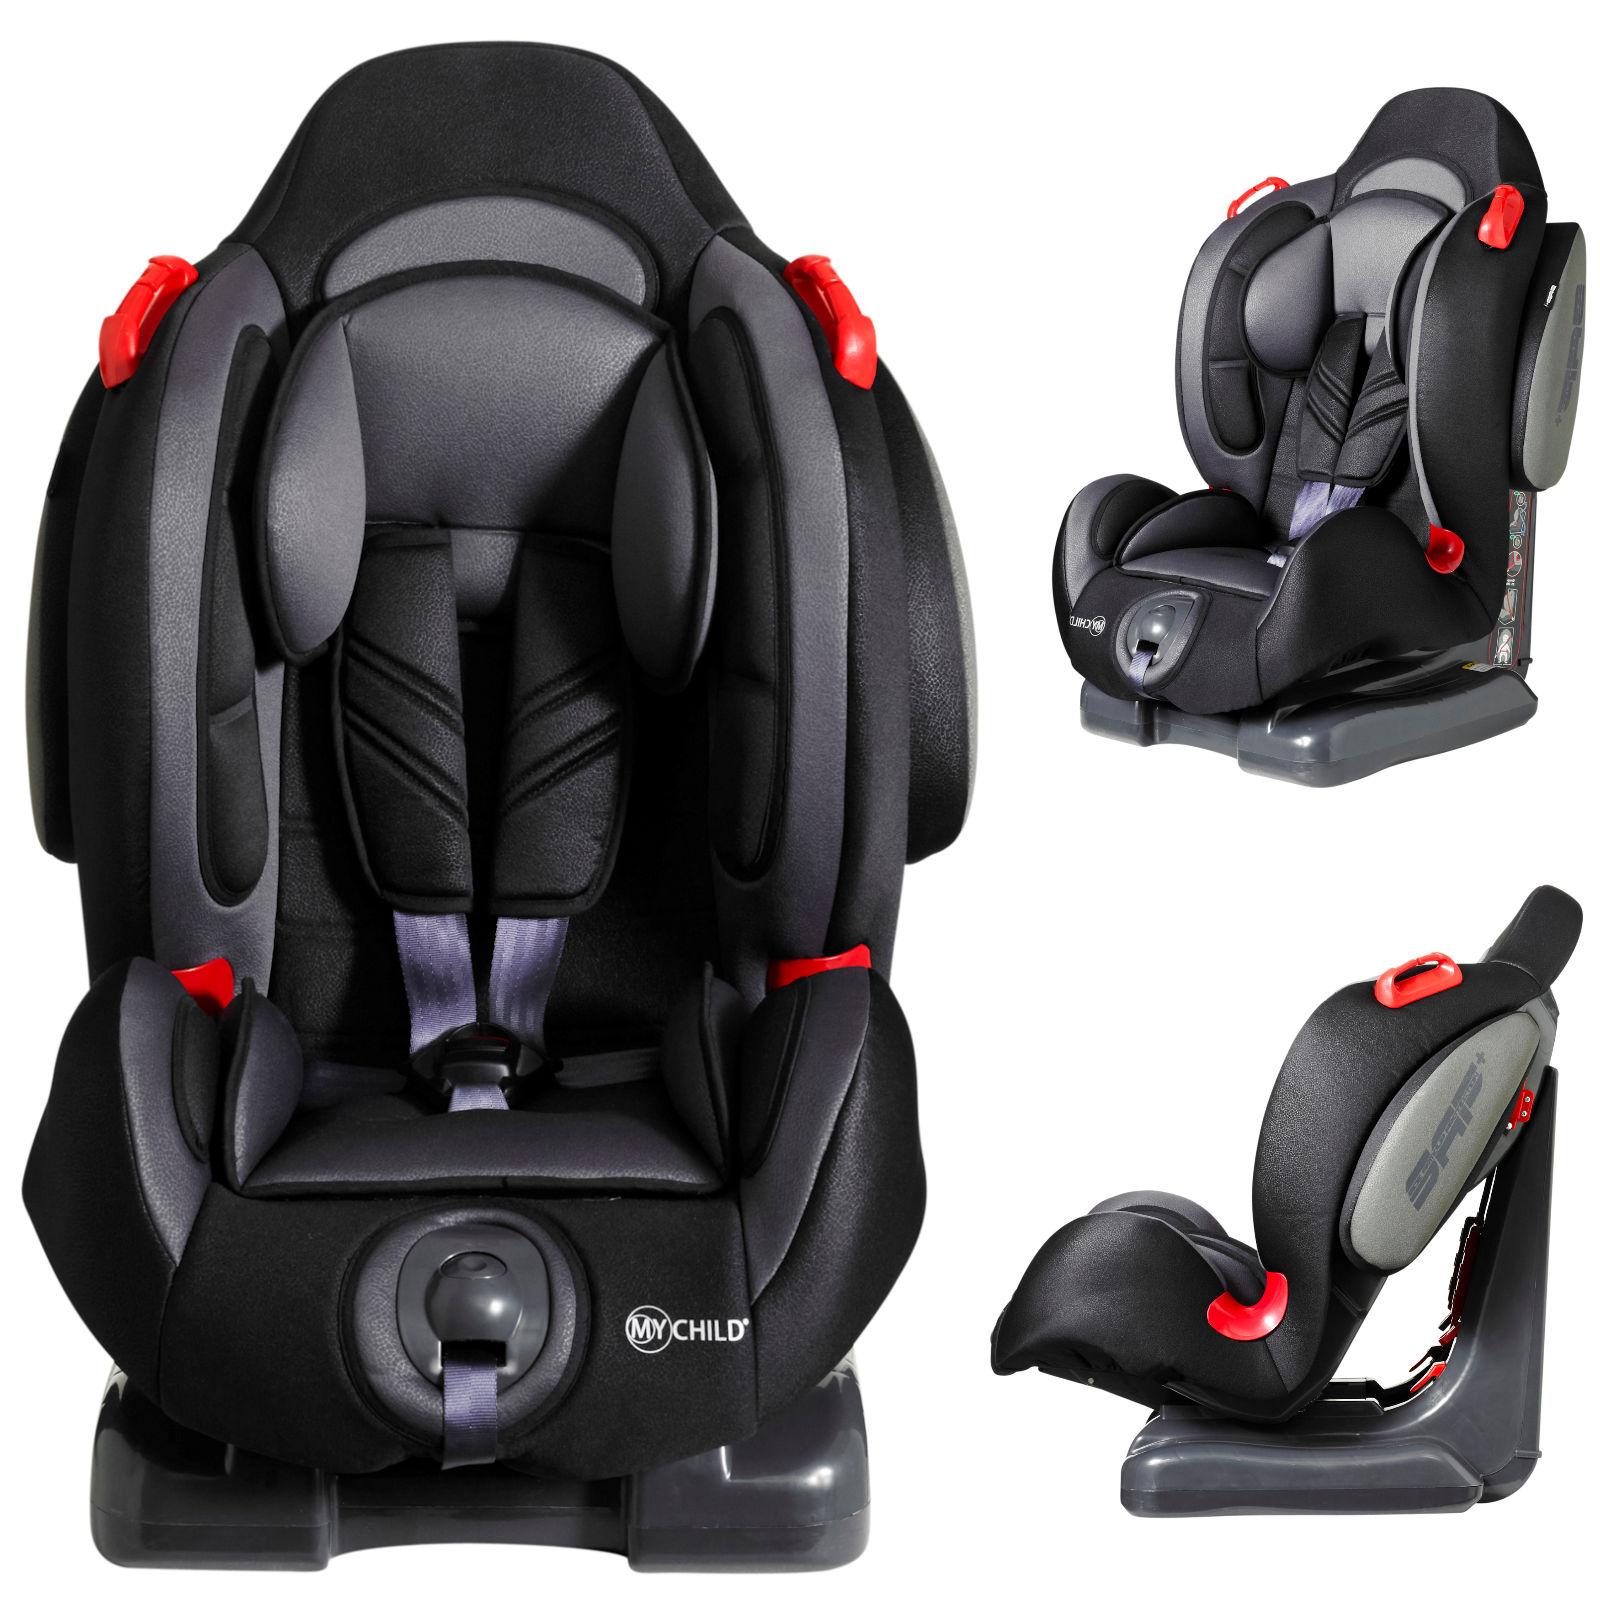 My Child Echo Plus Group 1/2 Car Seat - Black